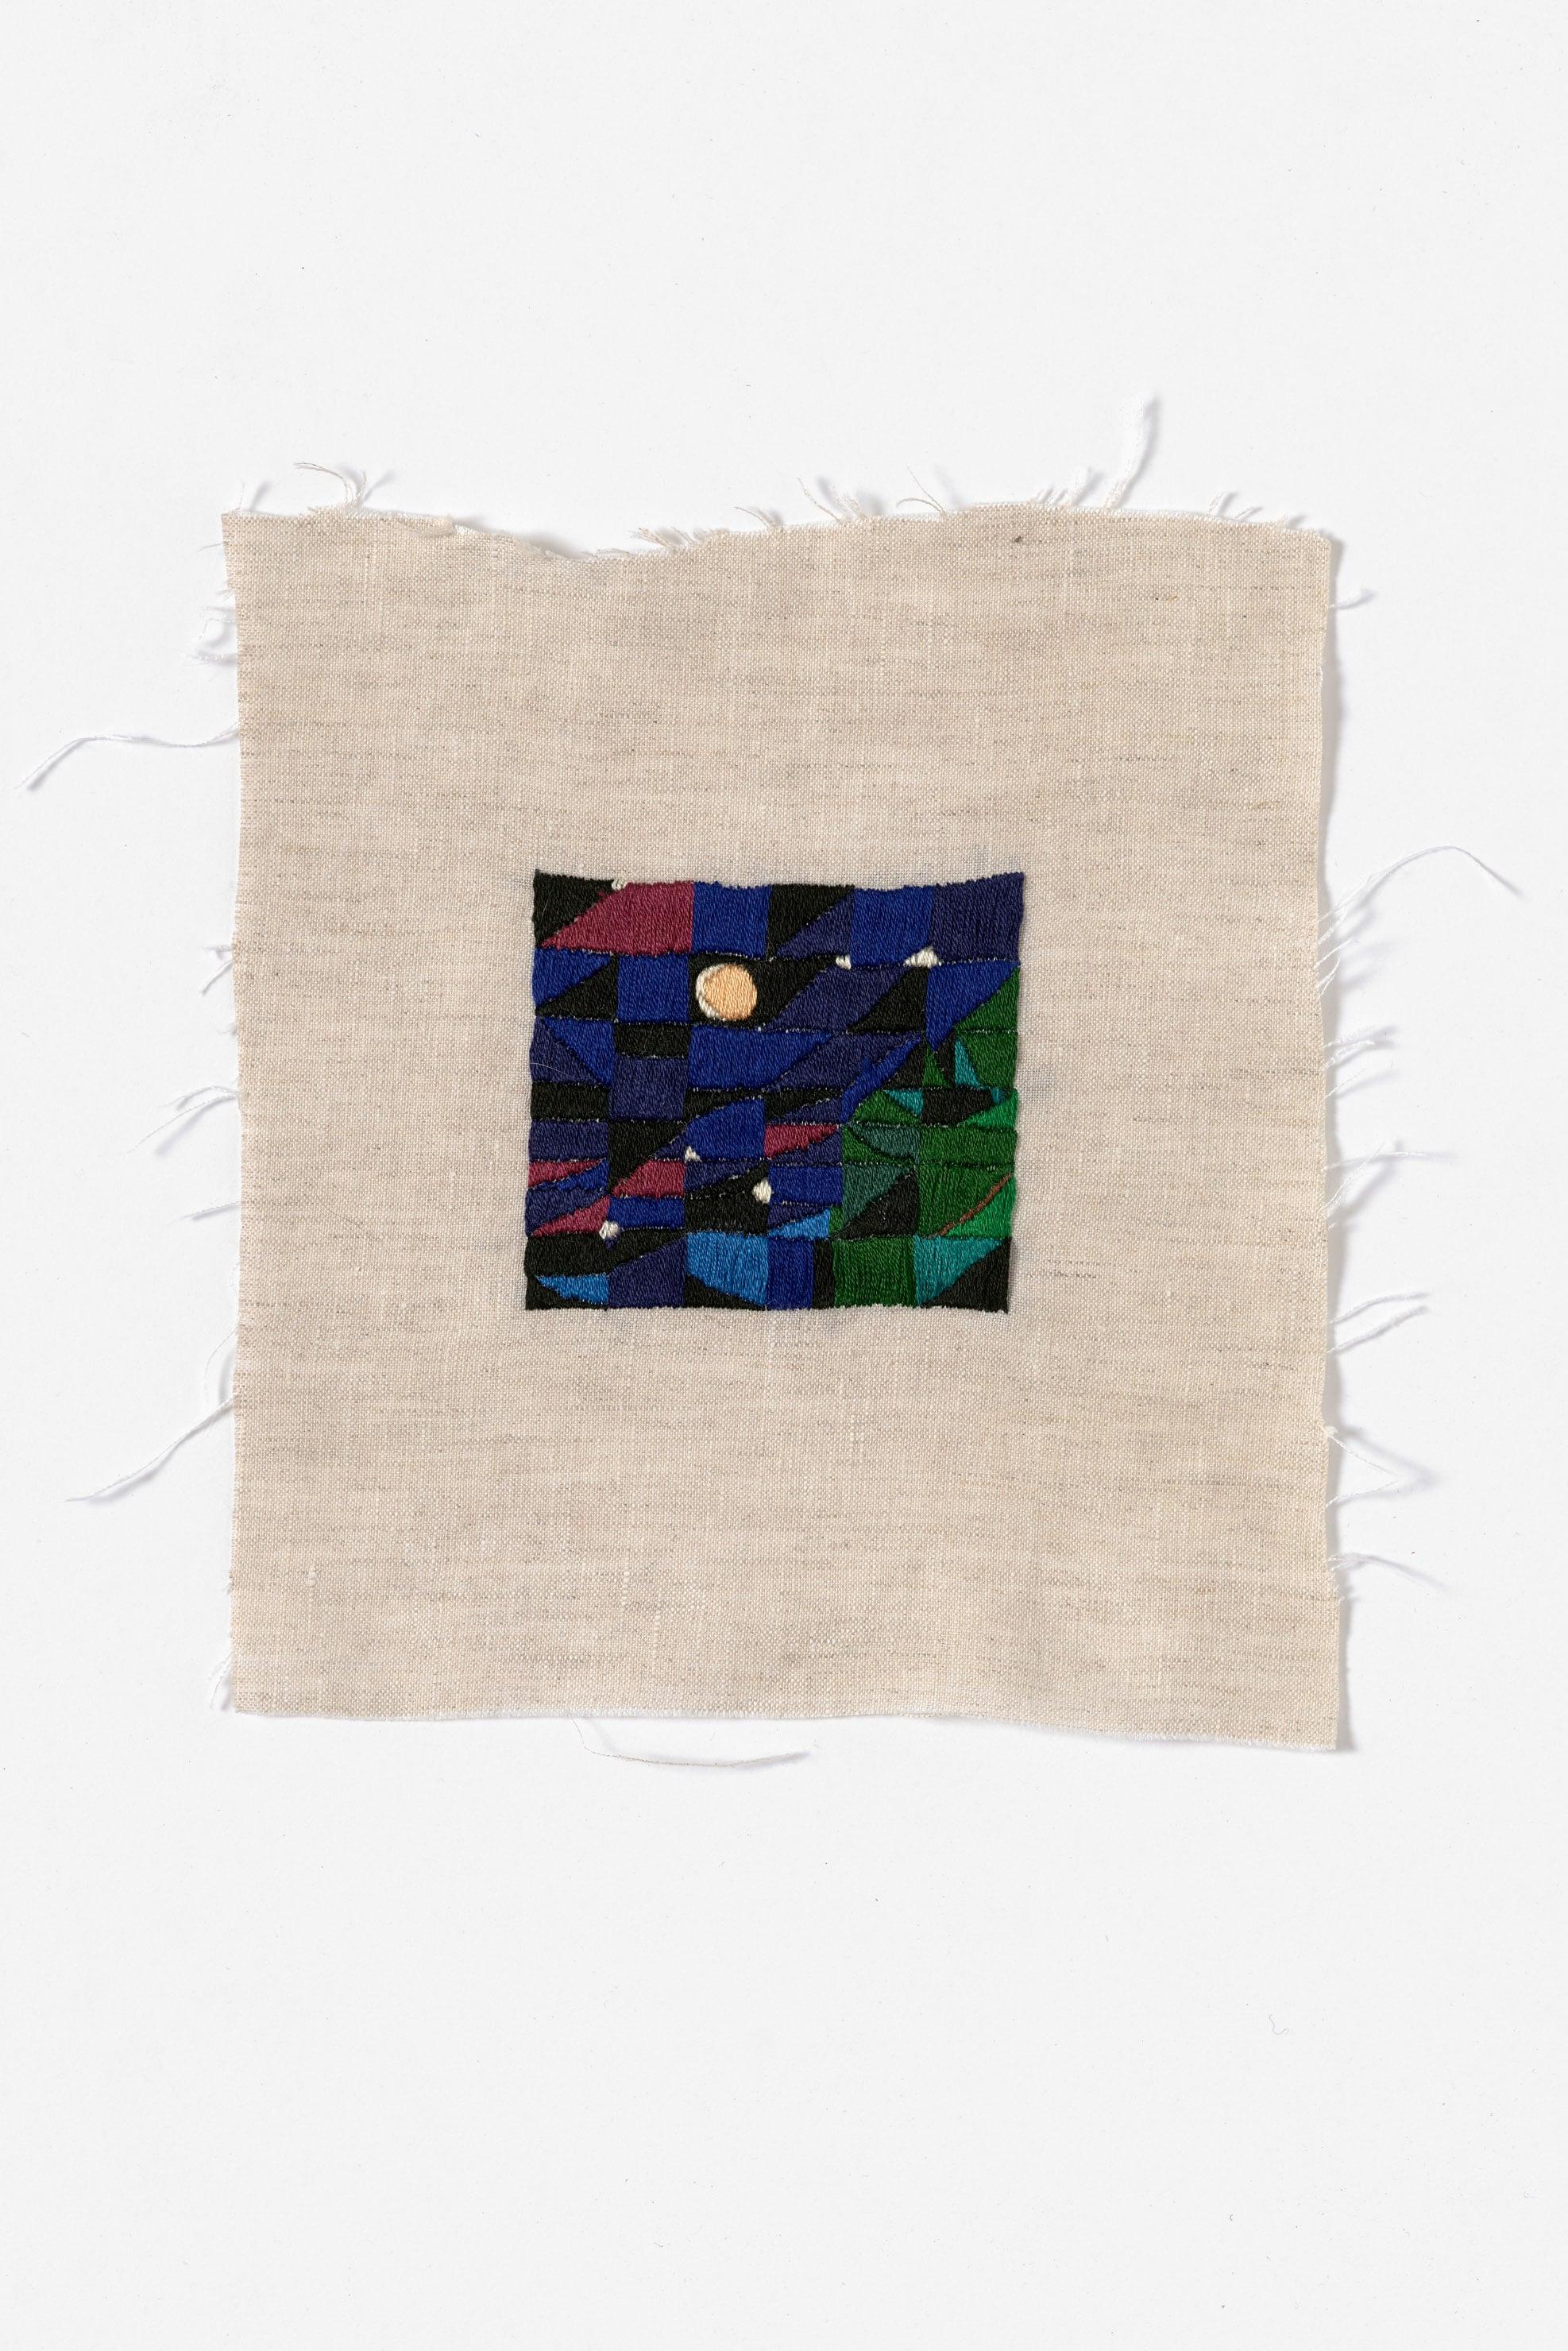 Campfire eclipse, Glen Forbes  2015 Cotton thread on linen 19.5 x 21.5cm